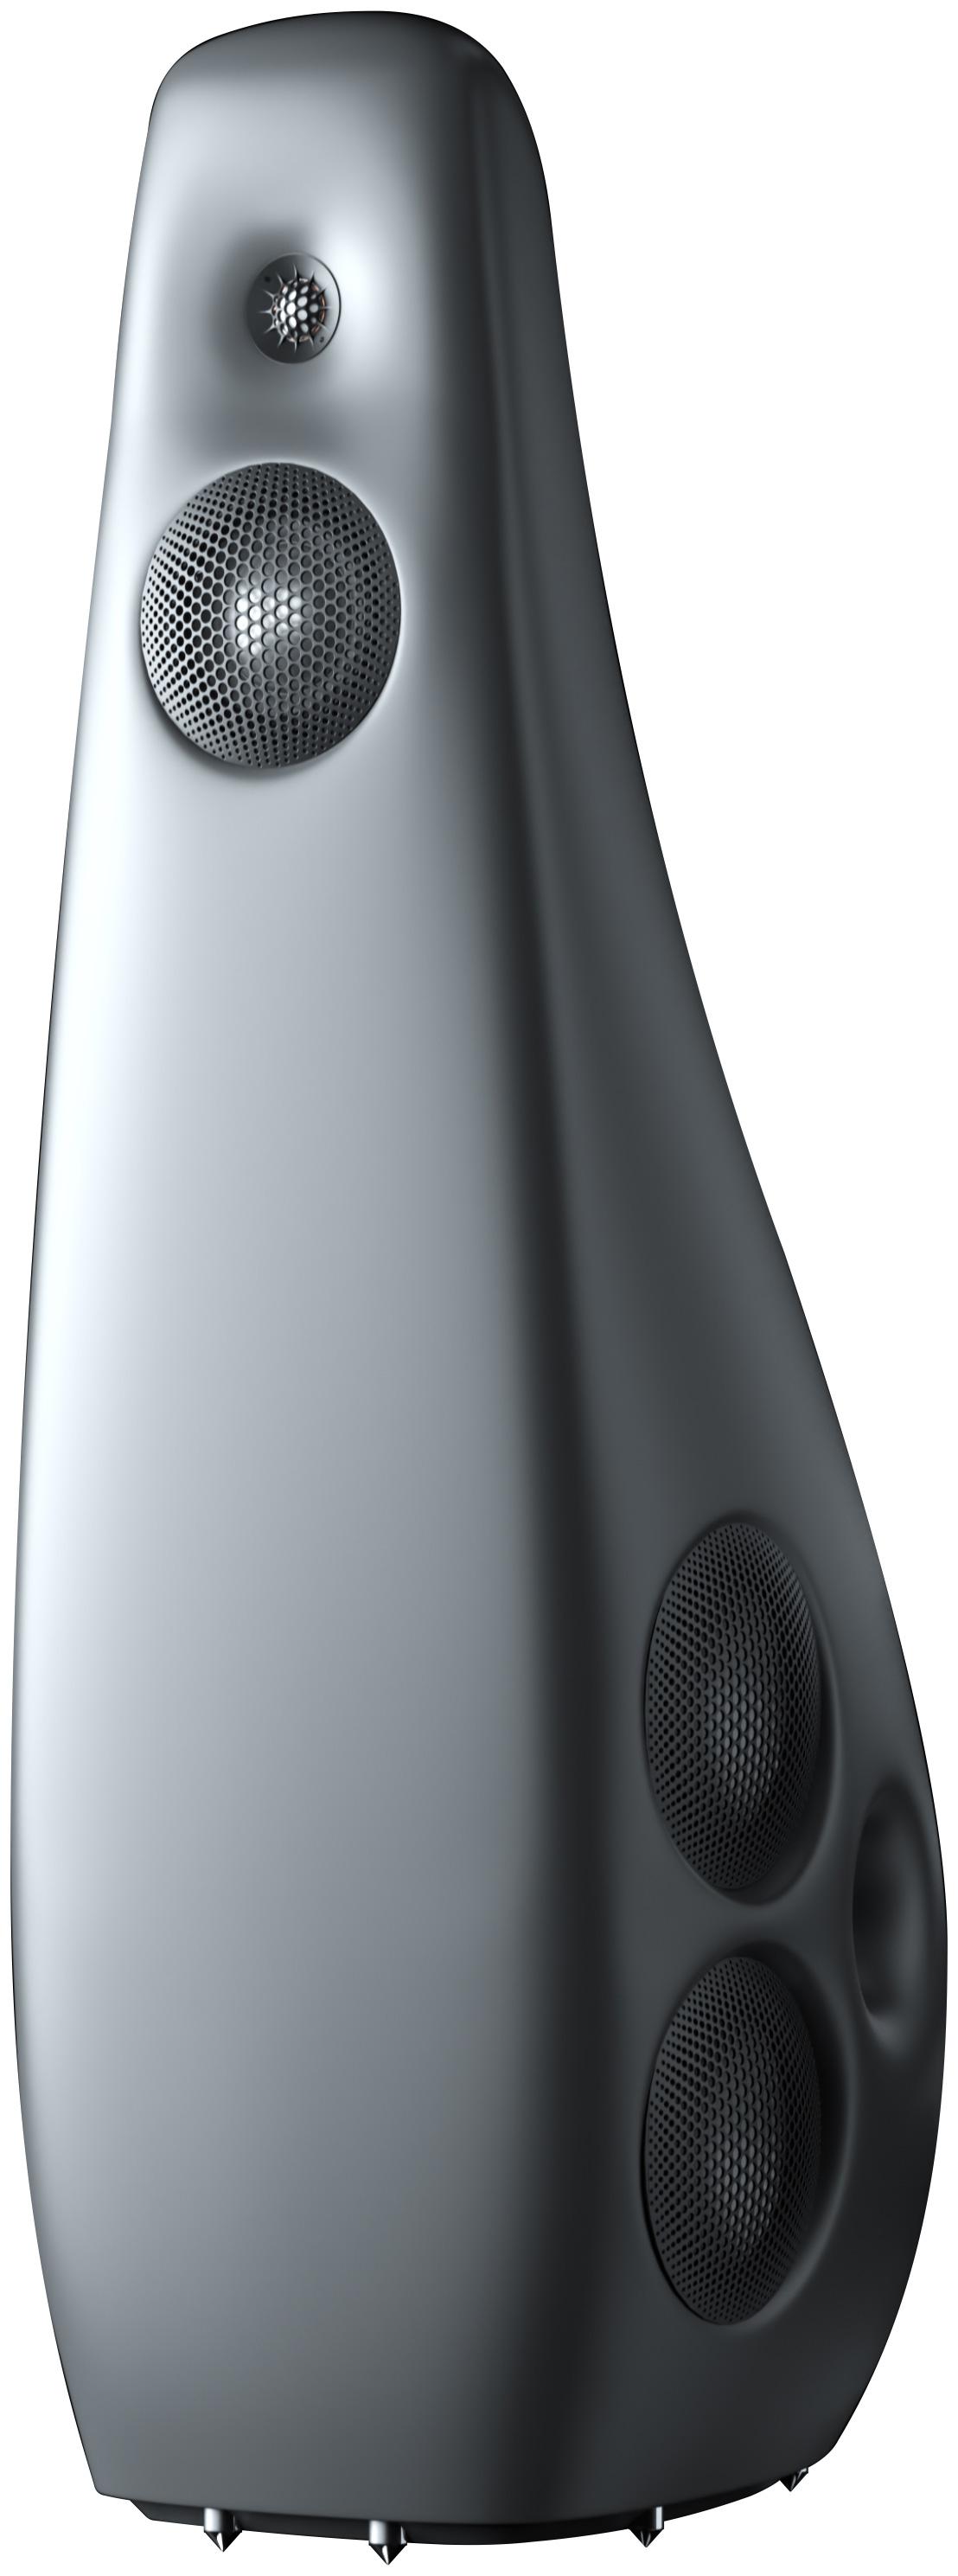 Vivid Audio Kaya 90 loudspeaker